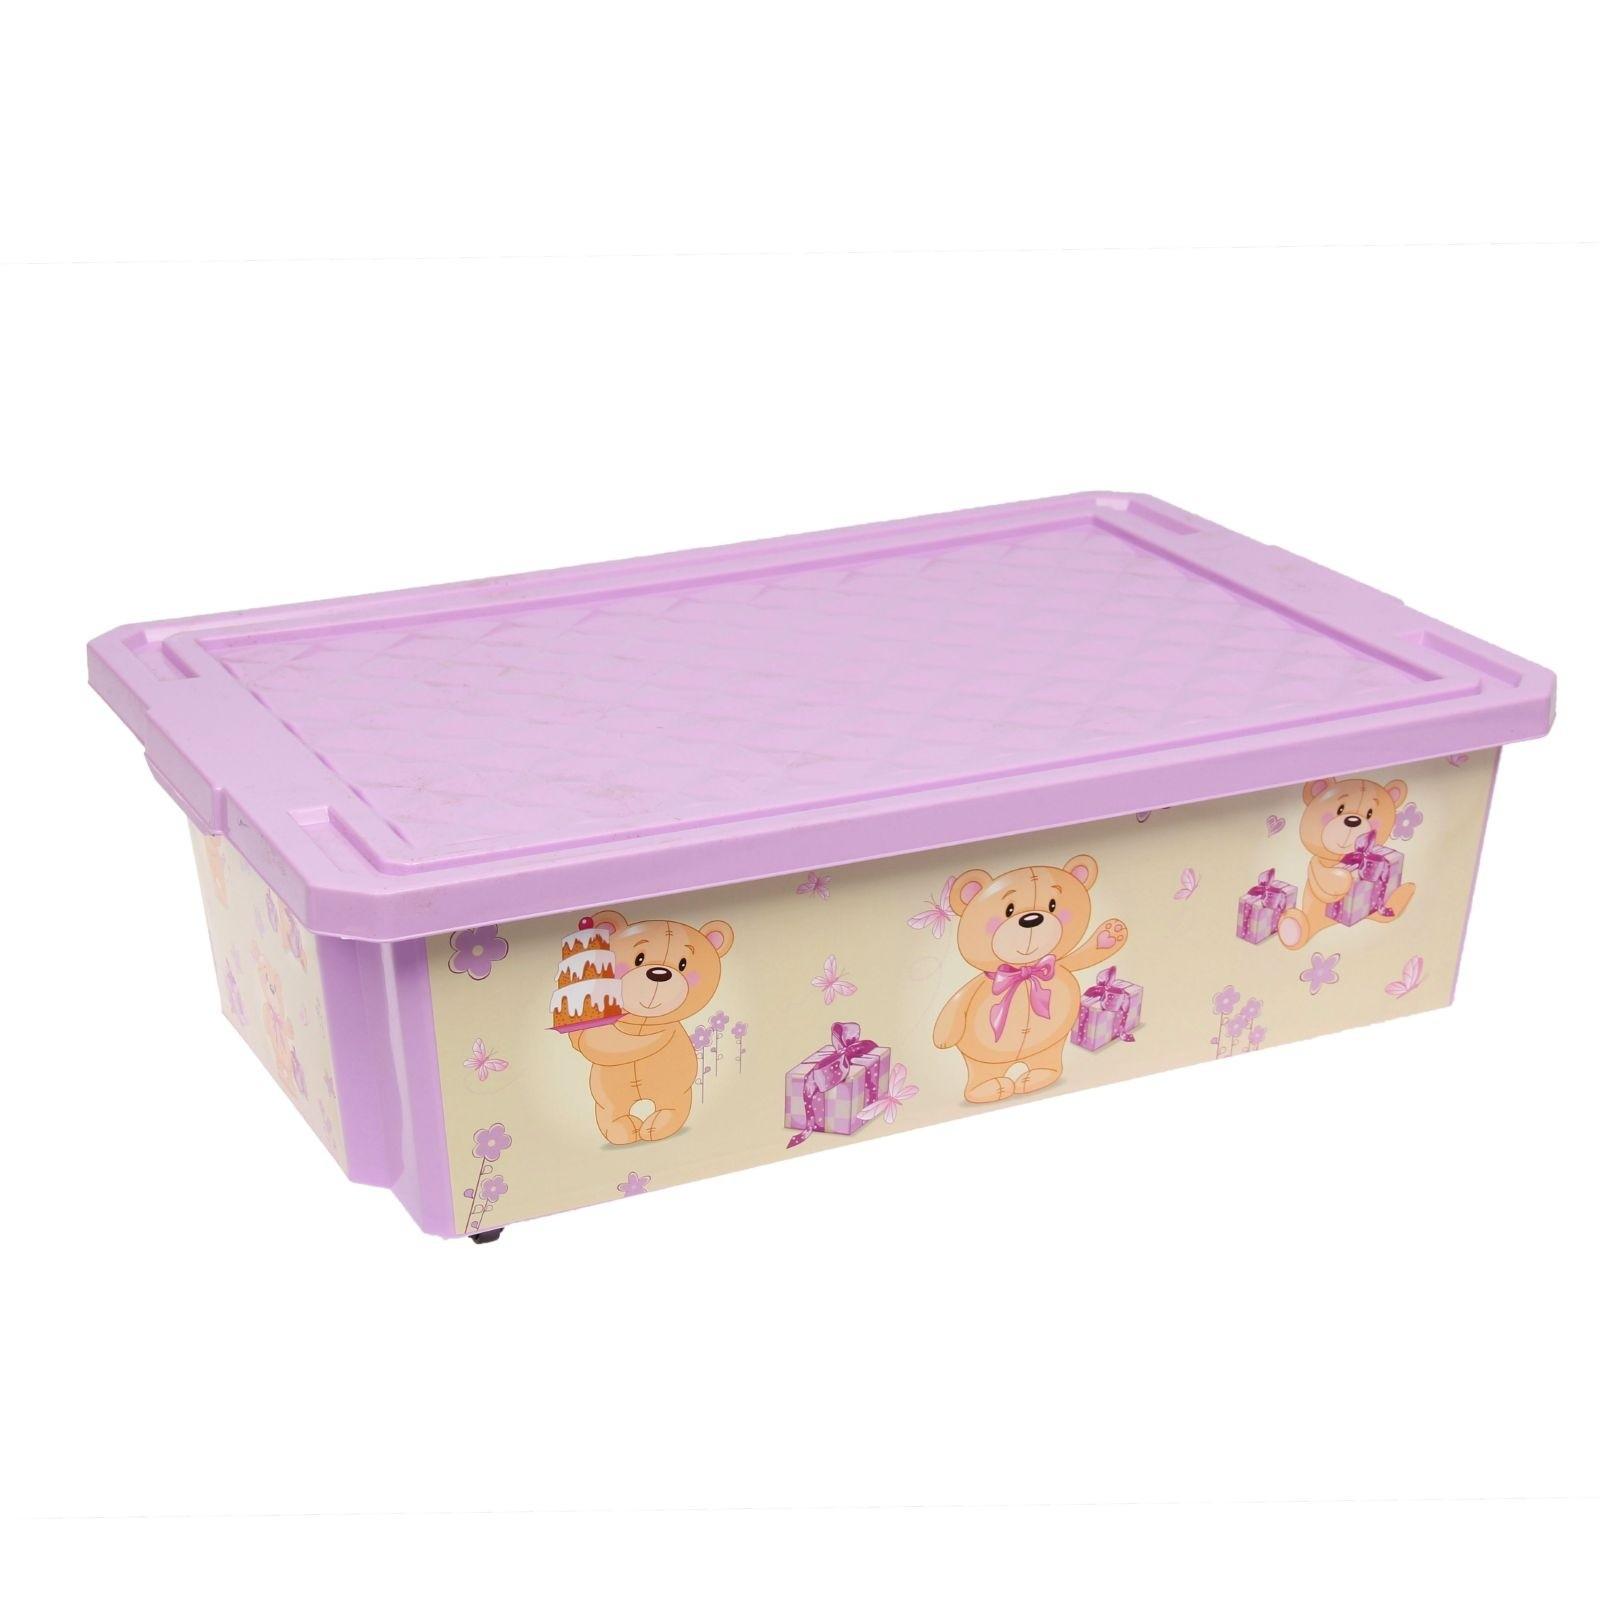 Ящик для хранения игрушек Little Angel X-Box Bears 30л на колесах Бежевый с розовым<br>